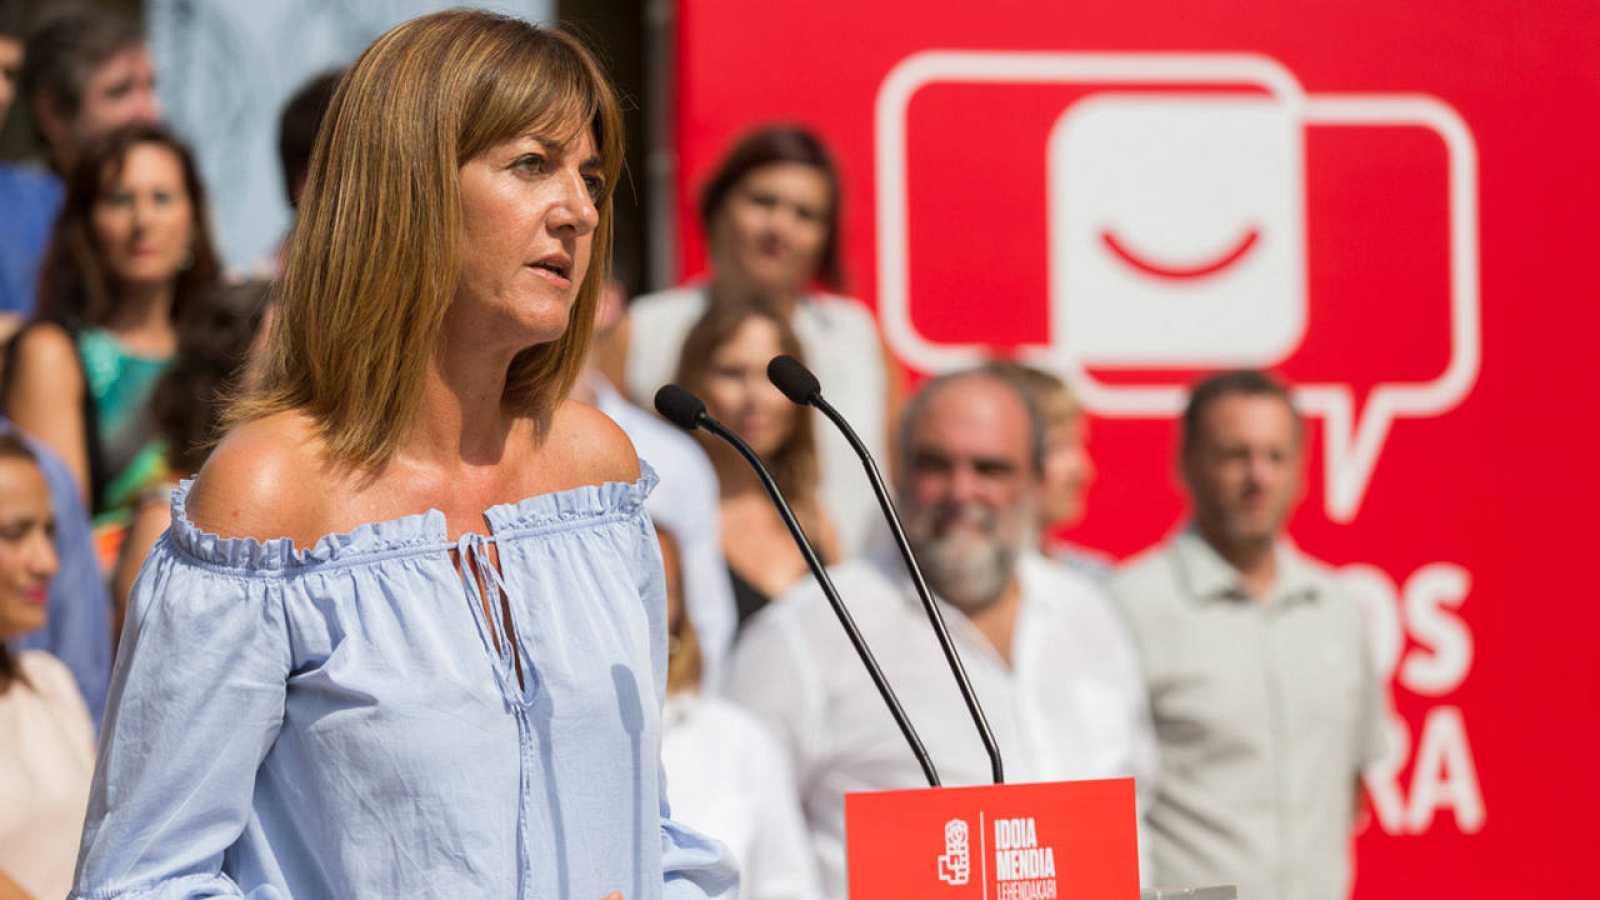 La secretaria general del PSE y candidata a lehendakari, Idoia Mendia.